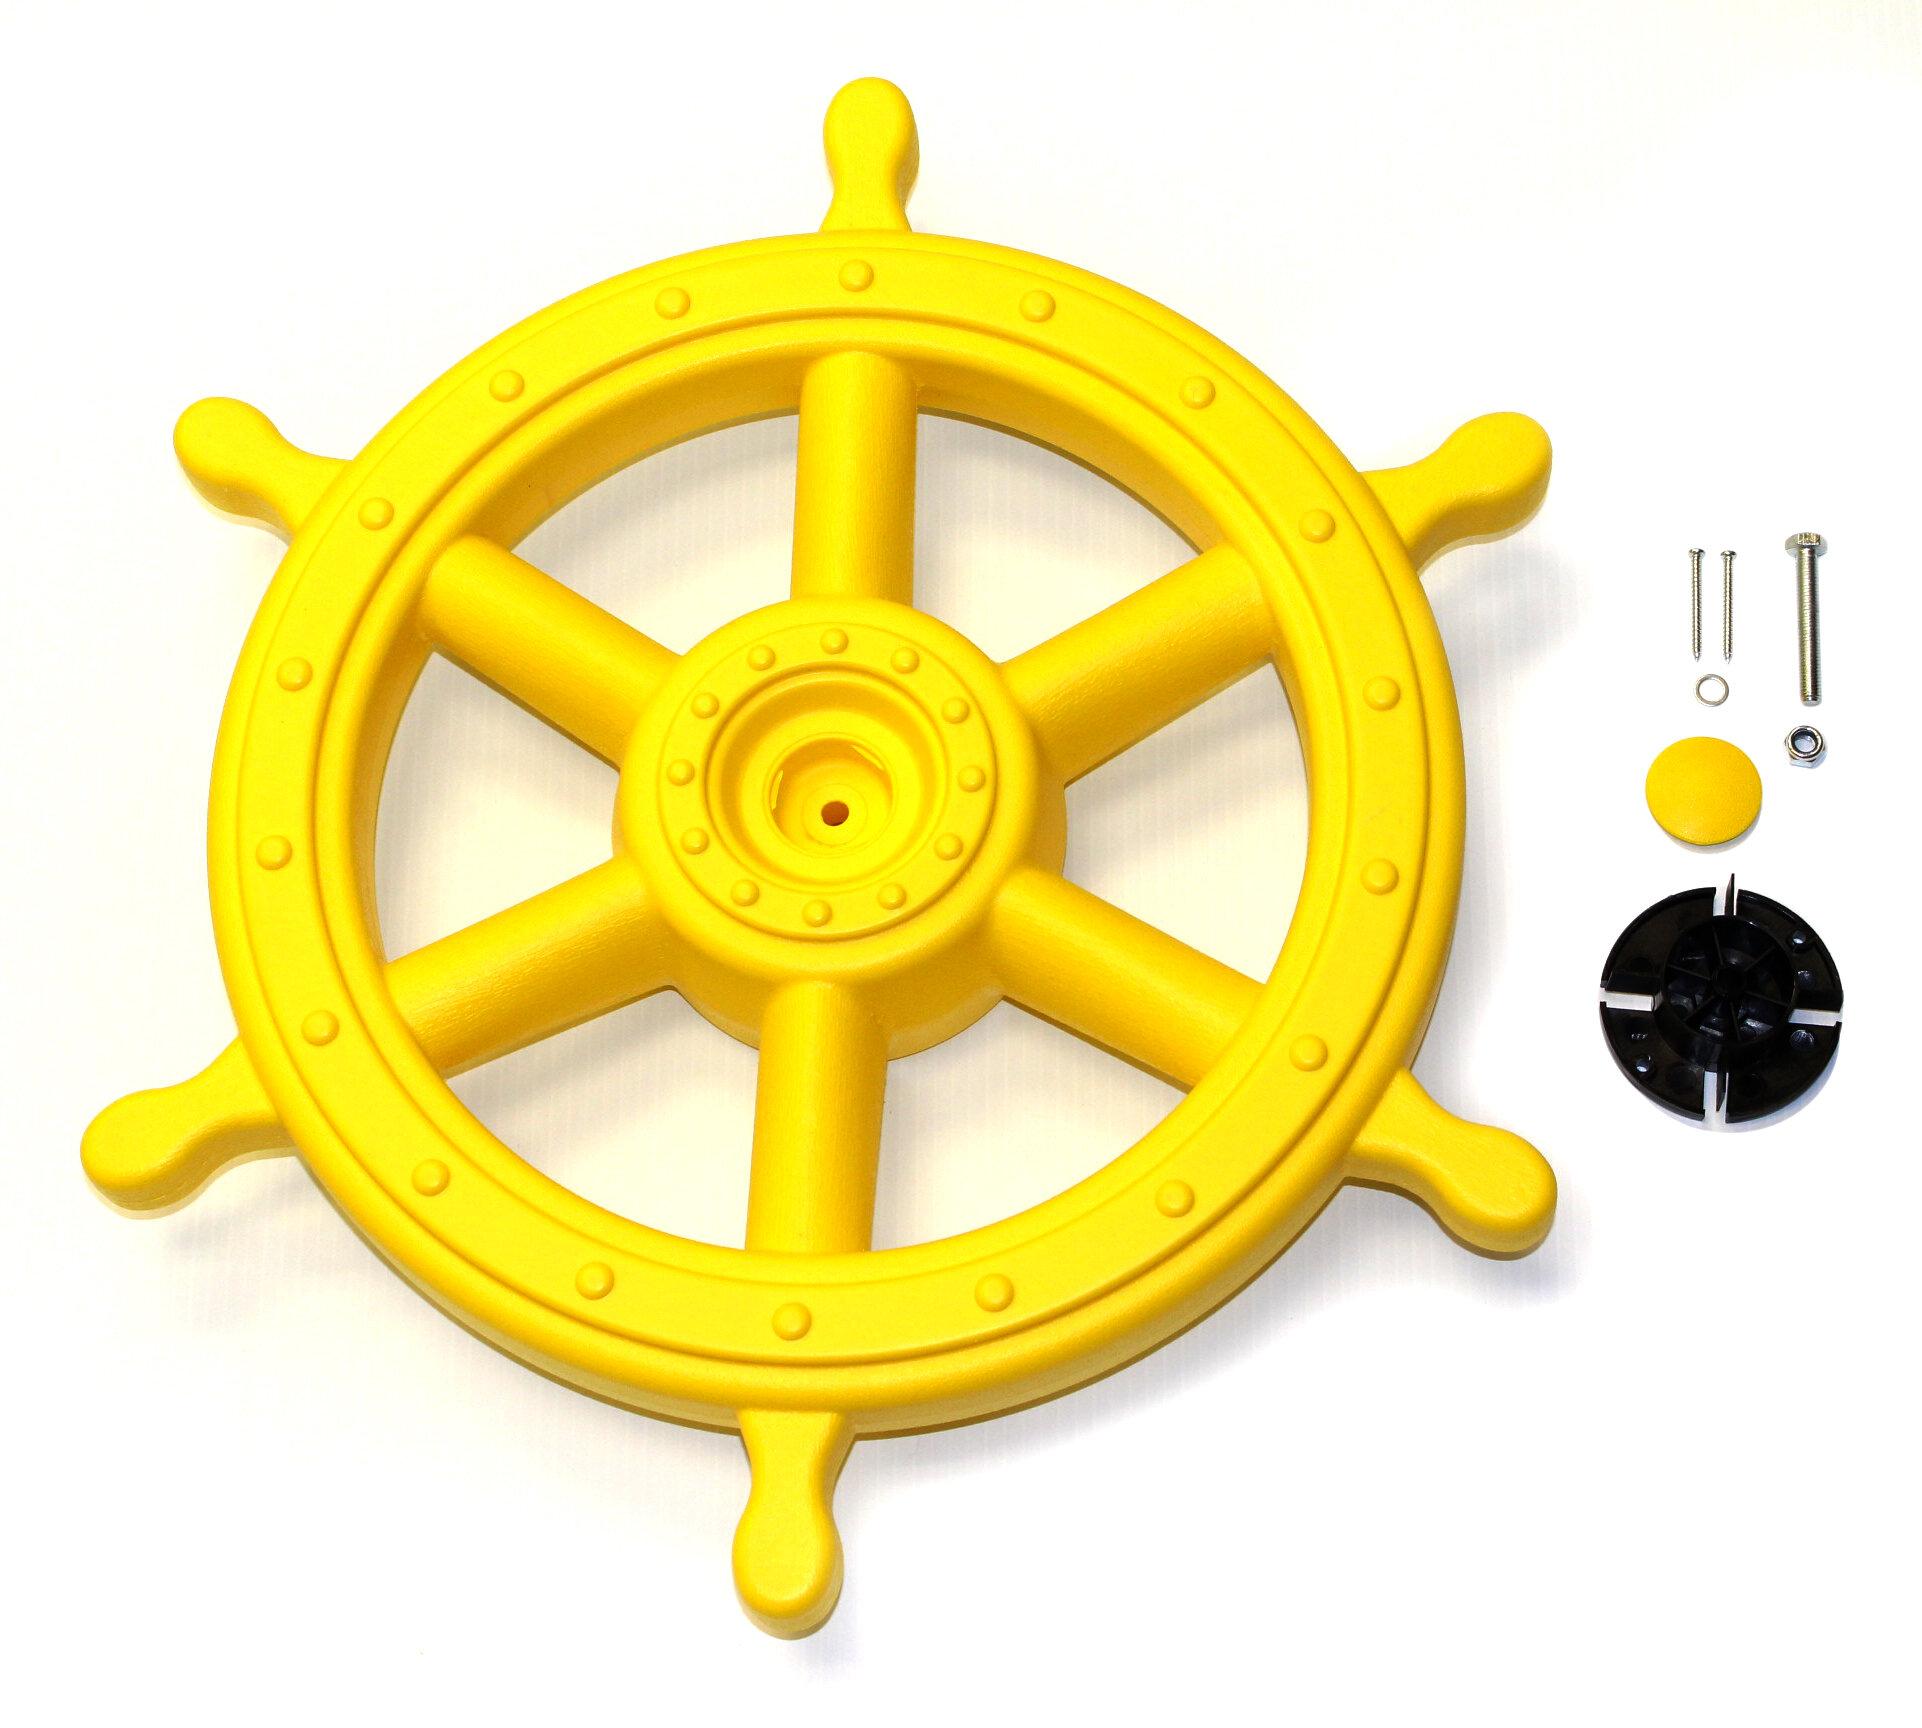 Eastern Jungle Gym Deluxe Captains Ship Wheel & Reviews | Wayfair